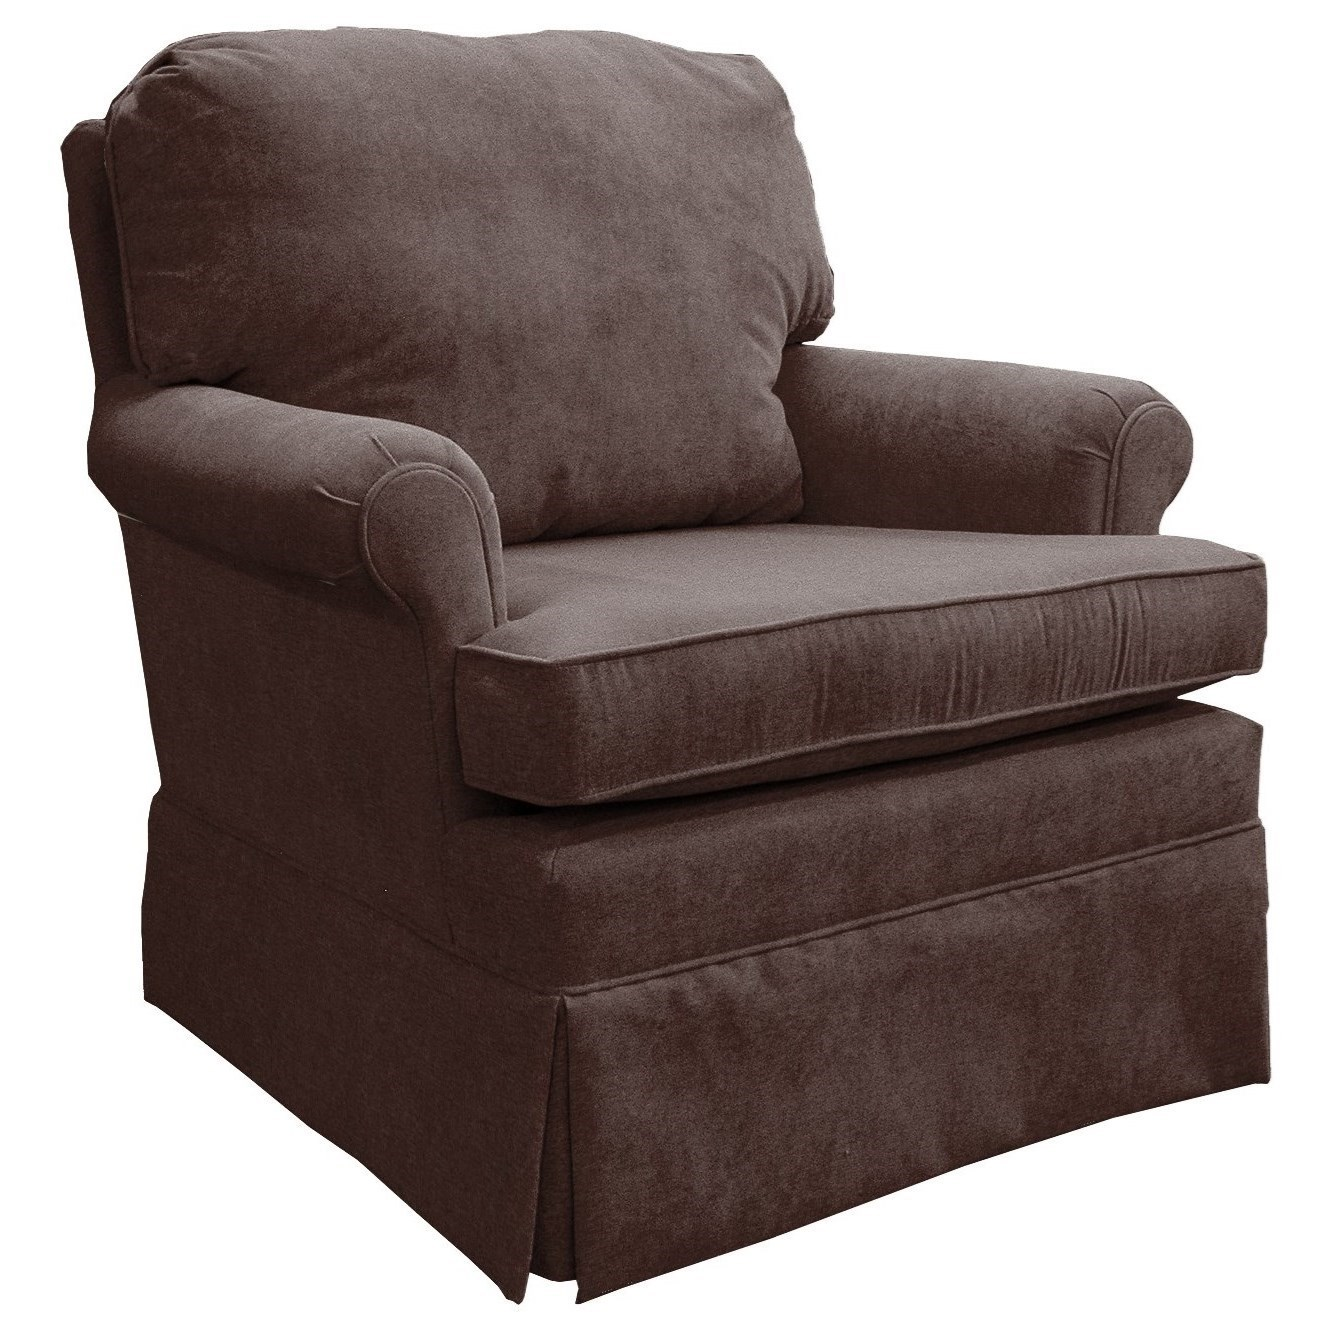 Best Home Furnishings PatokaGlider Club Chair  sc 1 st  Novello Furniture & Best Home Furnishings Patoka Comfortable Glider Club Chair   Novello ...